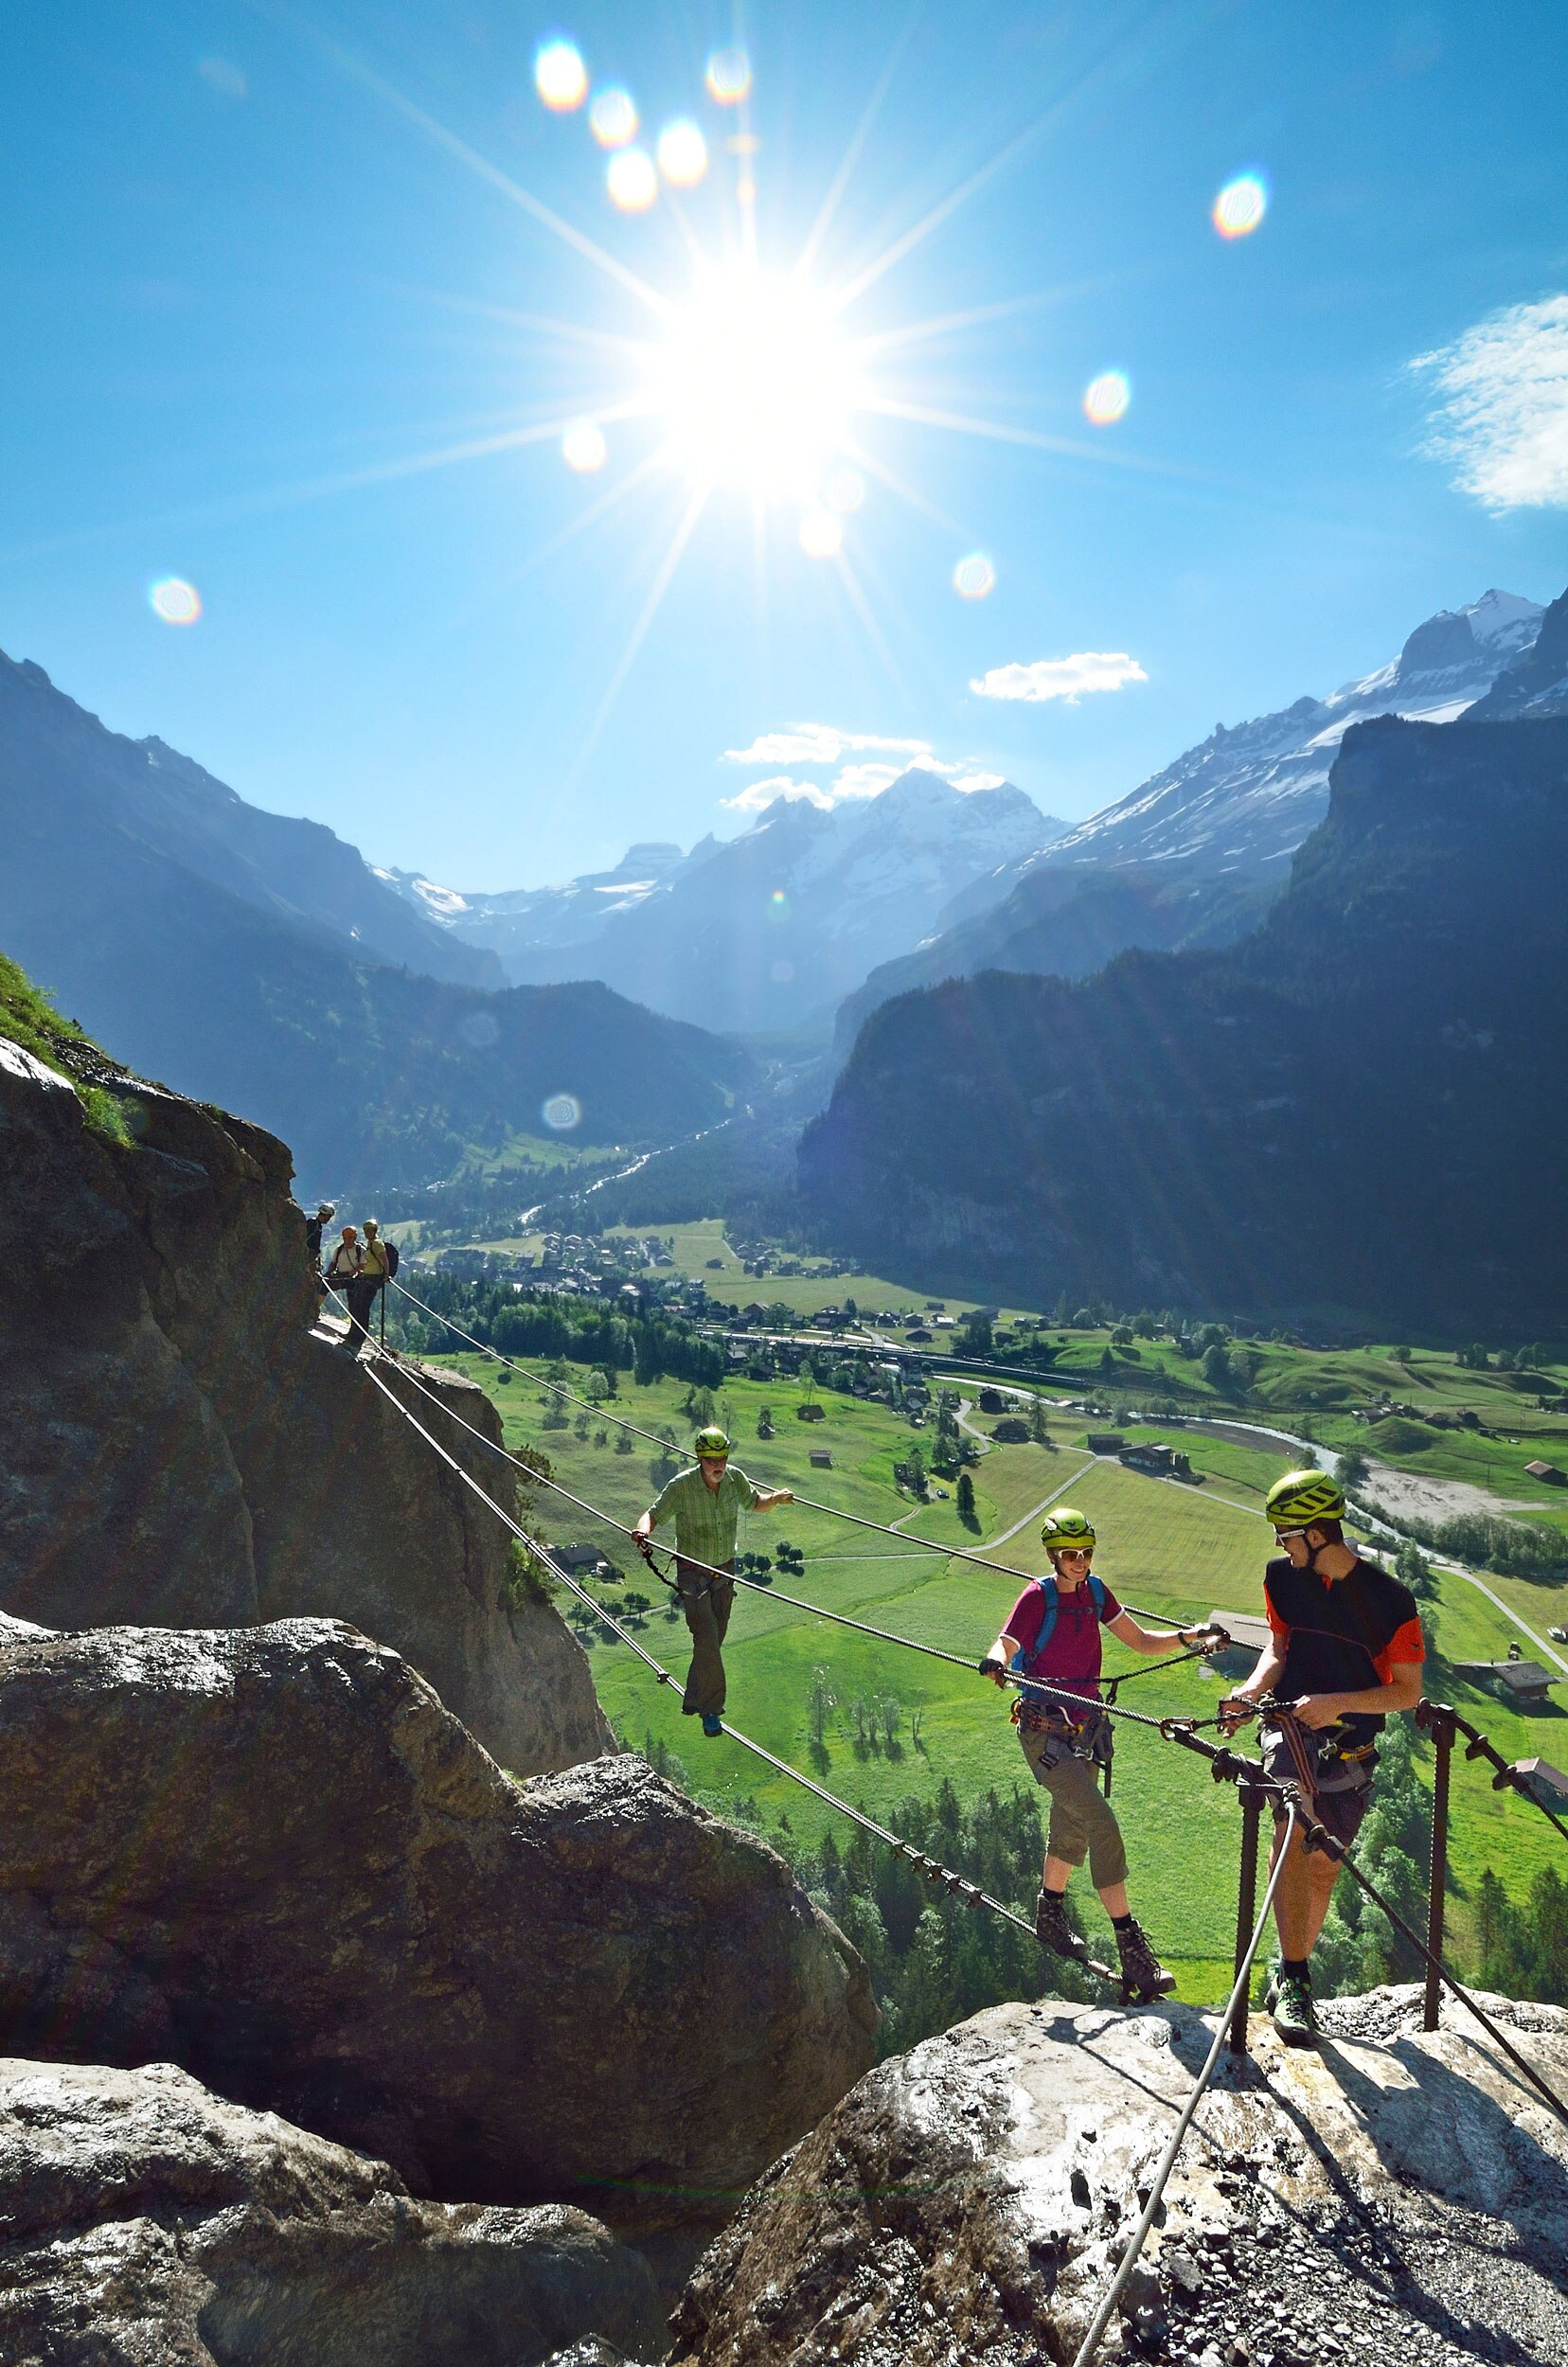 Klettersteig Allmenalp : Check der allmenalp klettersteig c d bergwelten